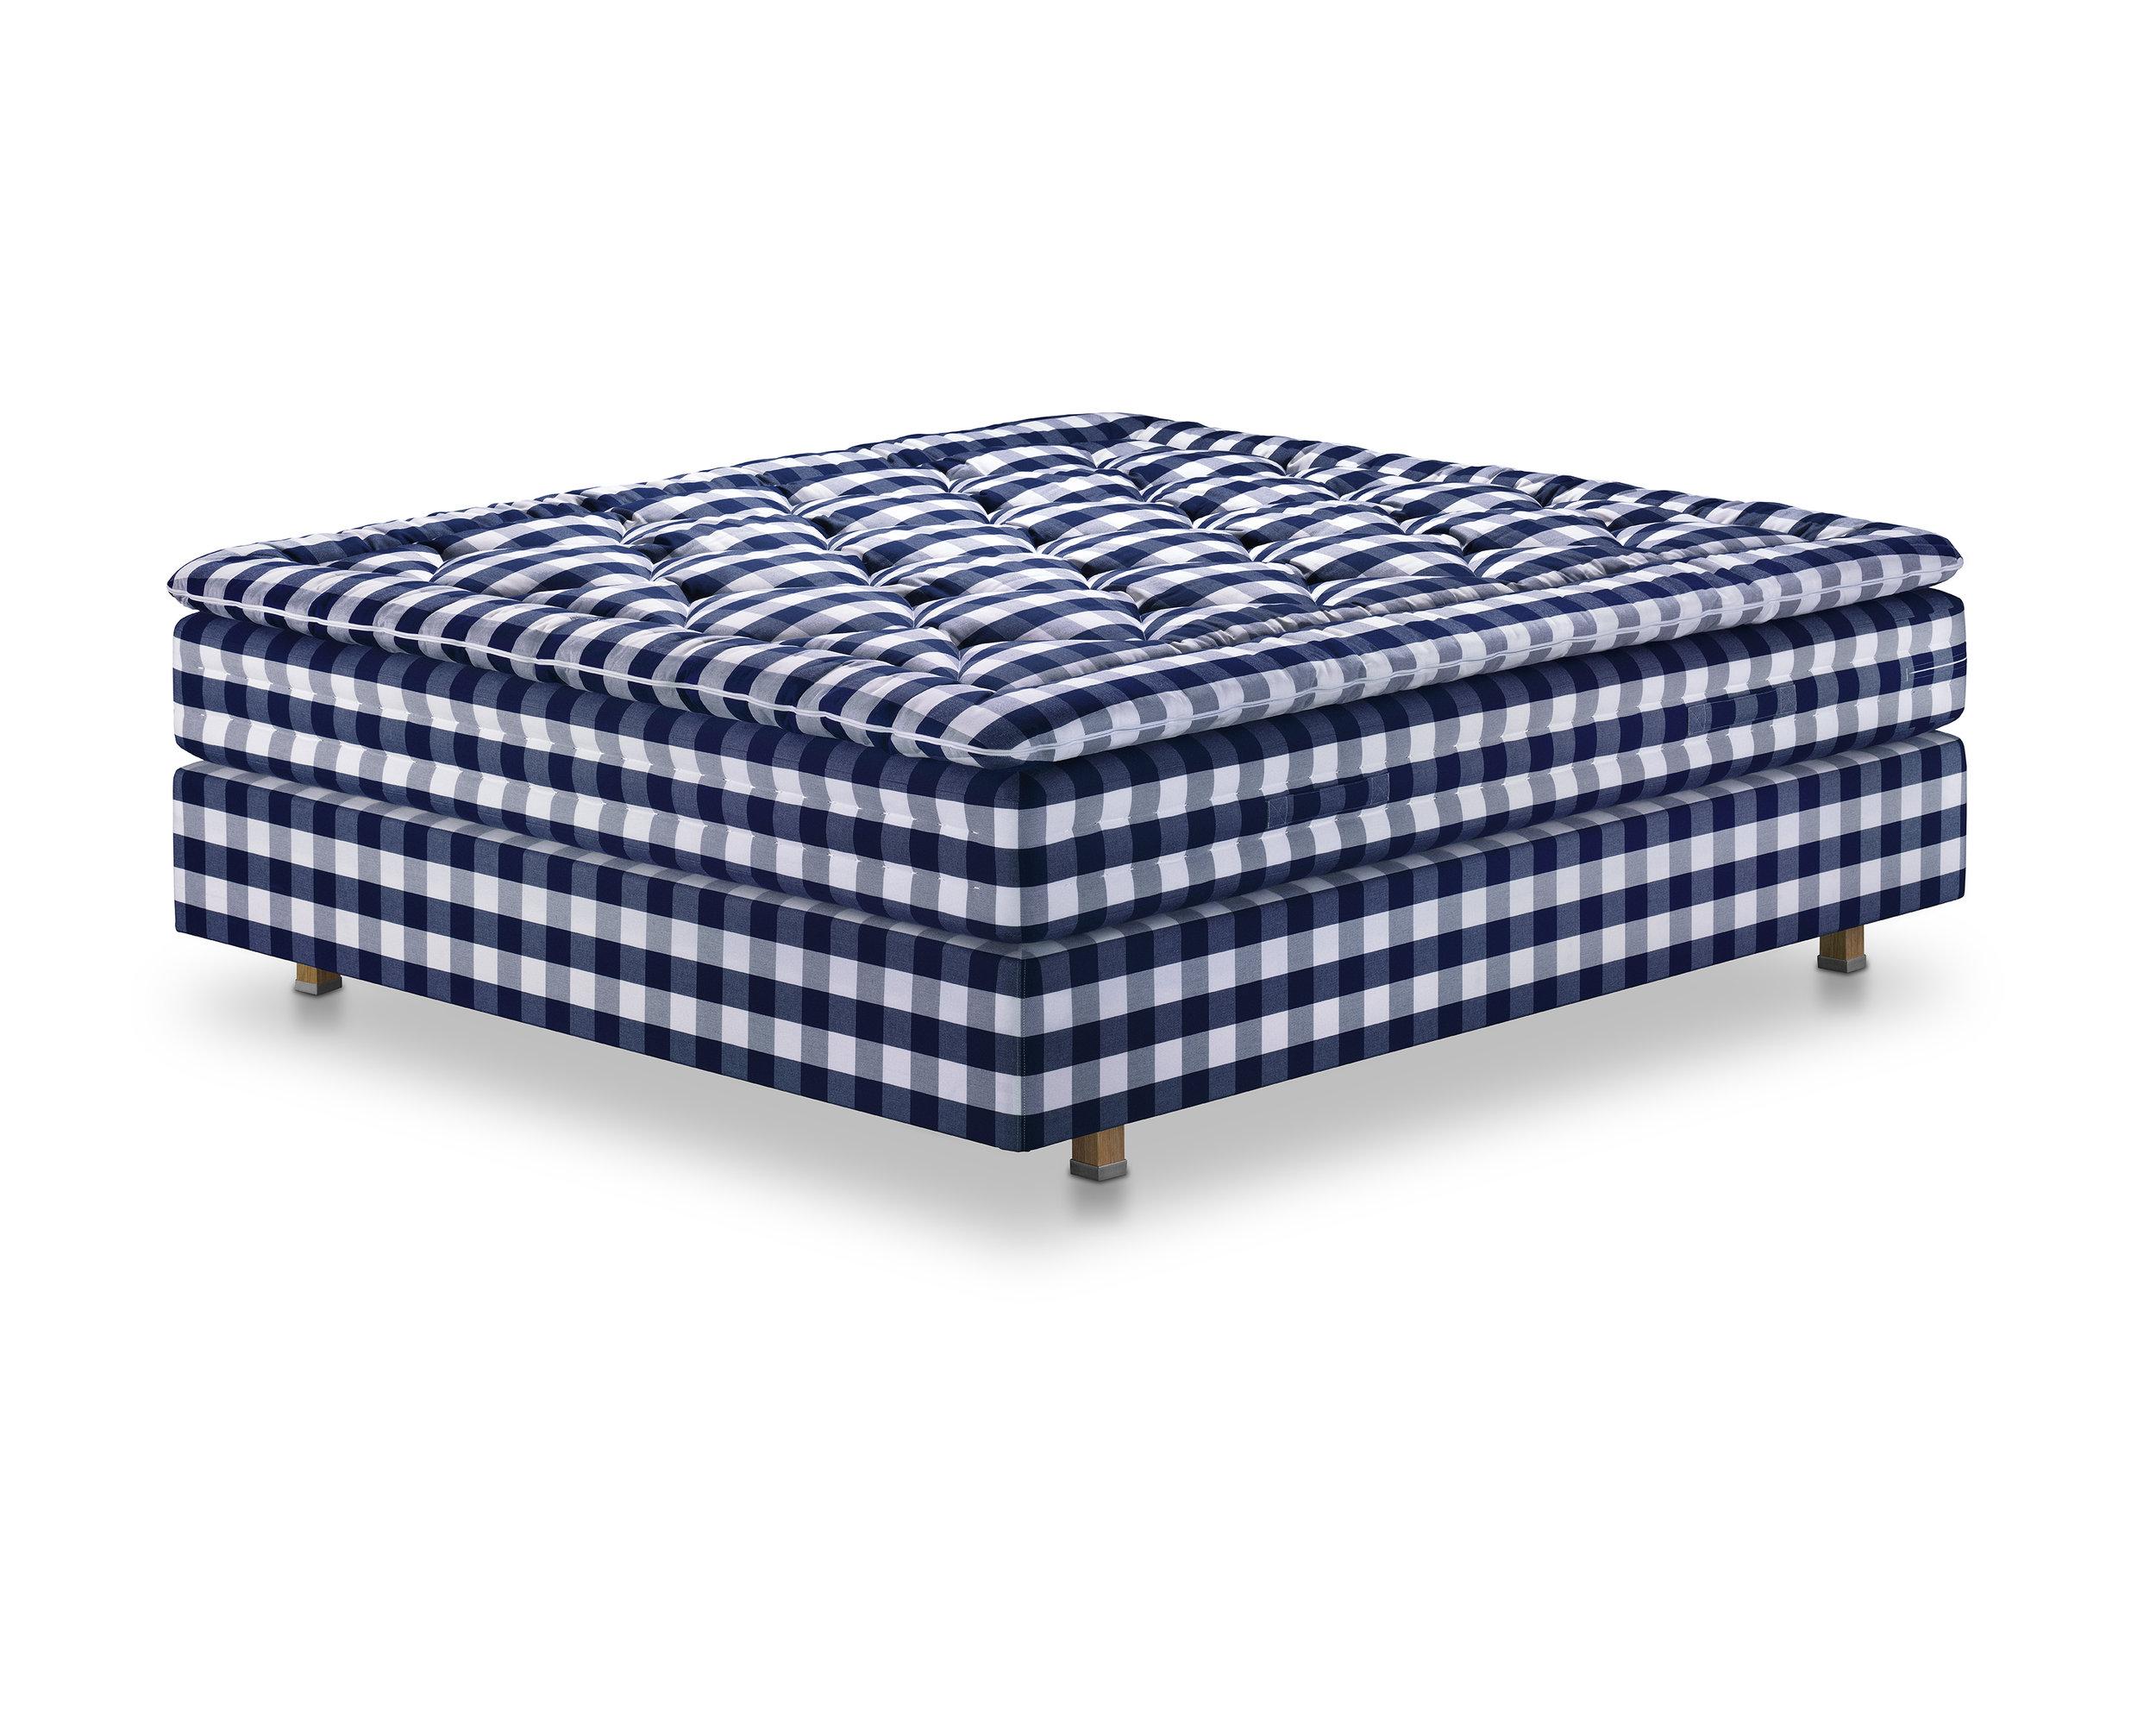 HERLEWING (Blue Check) - 180x210 cmBJX Luxury, med-firmSALE Preis CHF 22'704.00Originalpreis CHF 28'380.00-HERLEWING (Black Check)160x200BJ, soft/mediumSALE Preis 17'290.00Originalpreis CHF 21'612.00